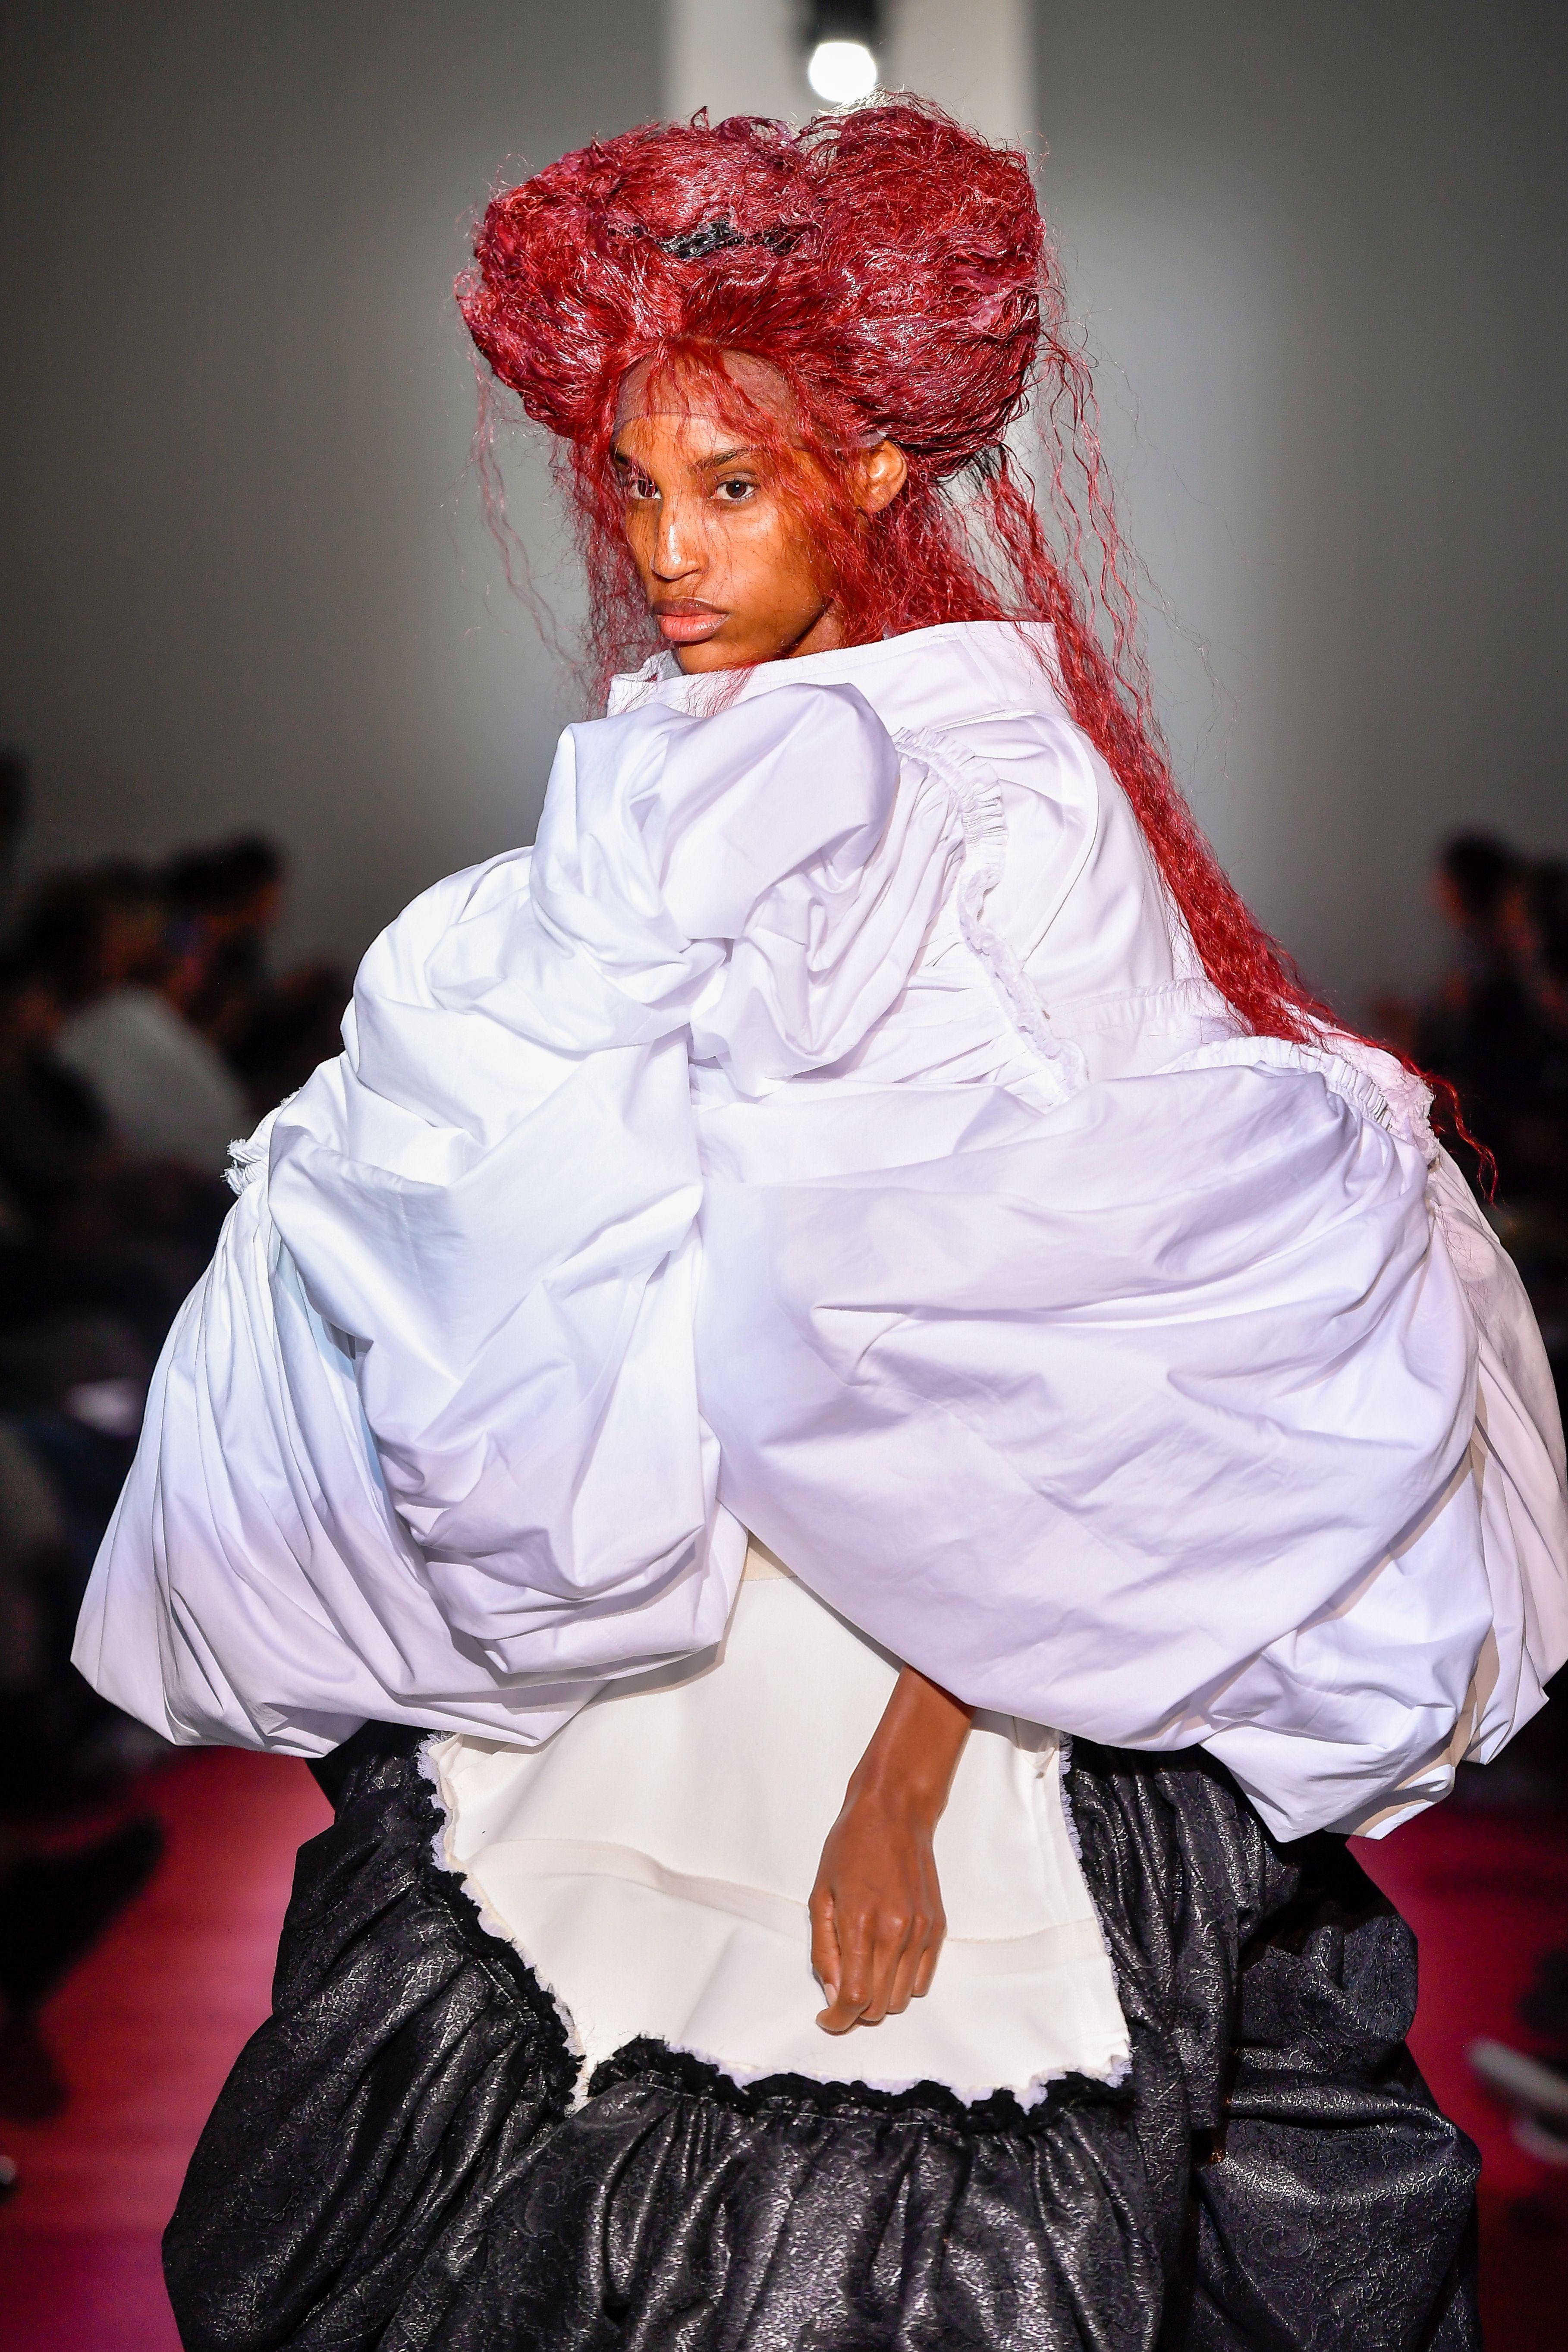 Model on the catwalkComme Des Garcons show, Runway, Spring Summer 2020, Paris Fashion Week, France - 28 Sep 2019